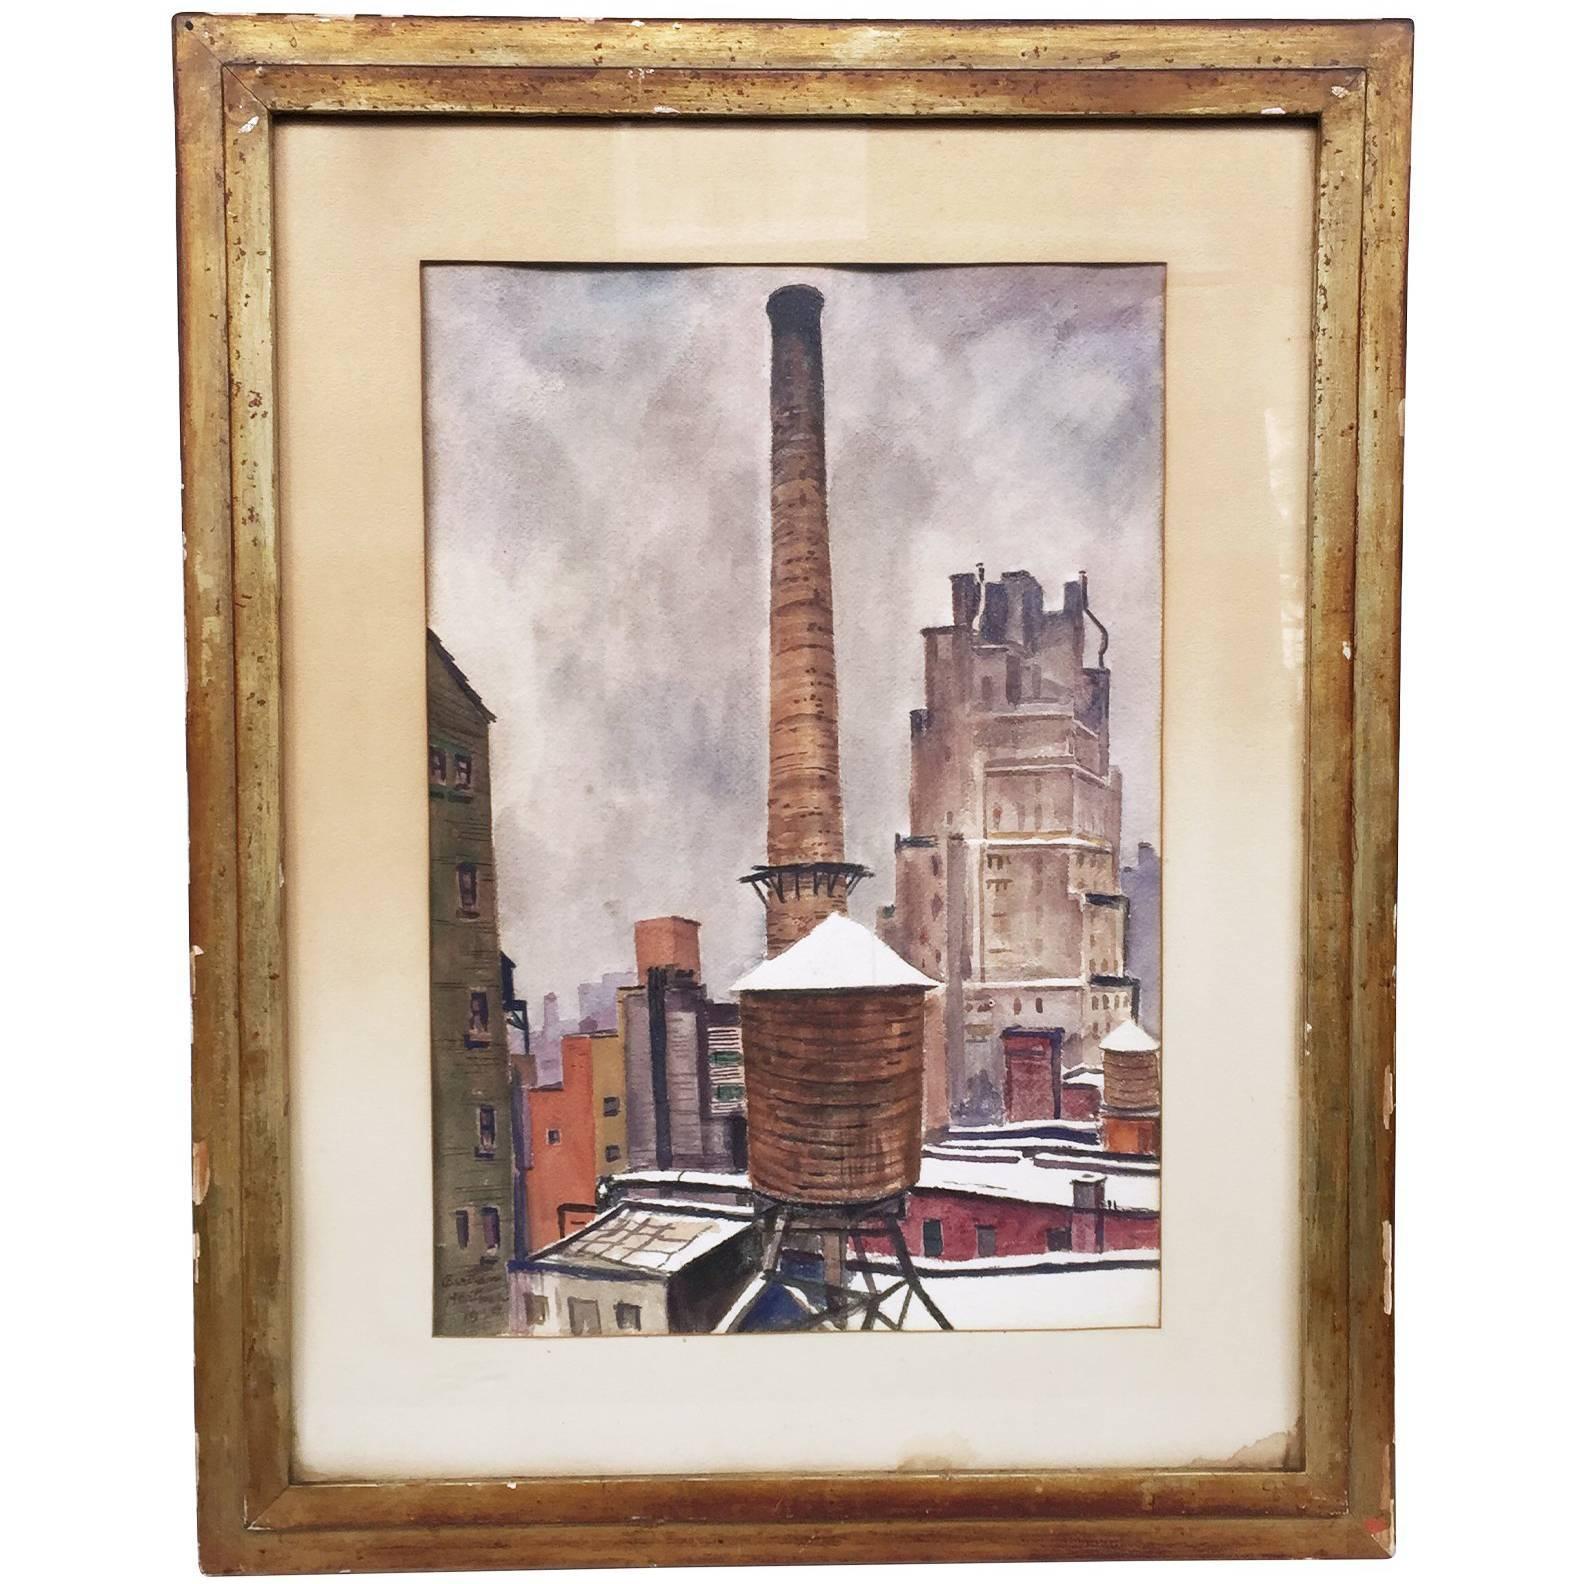 New York Cityscape Watercolor by Bertram Hartman, 1939